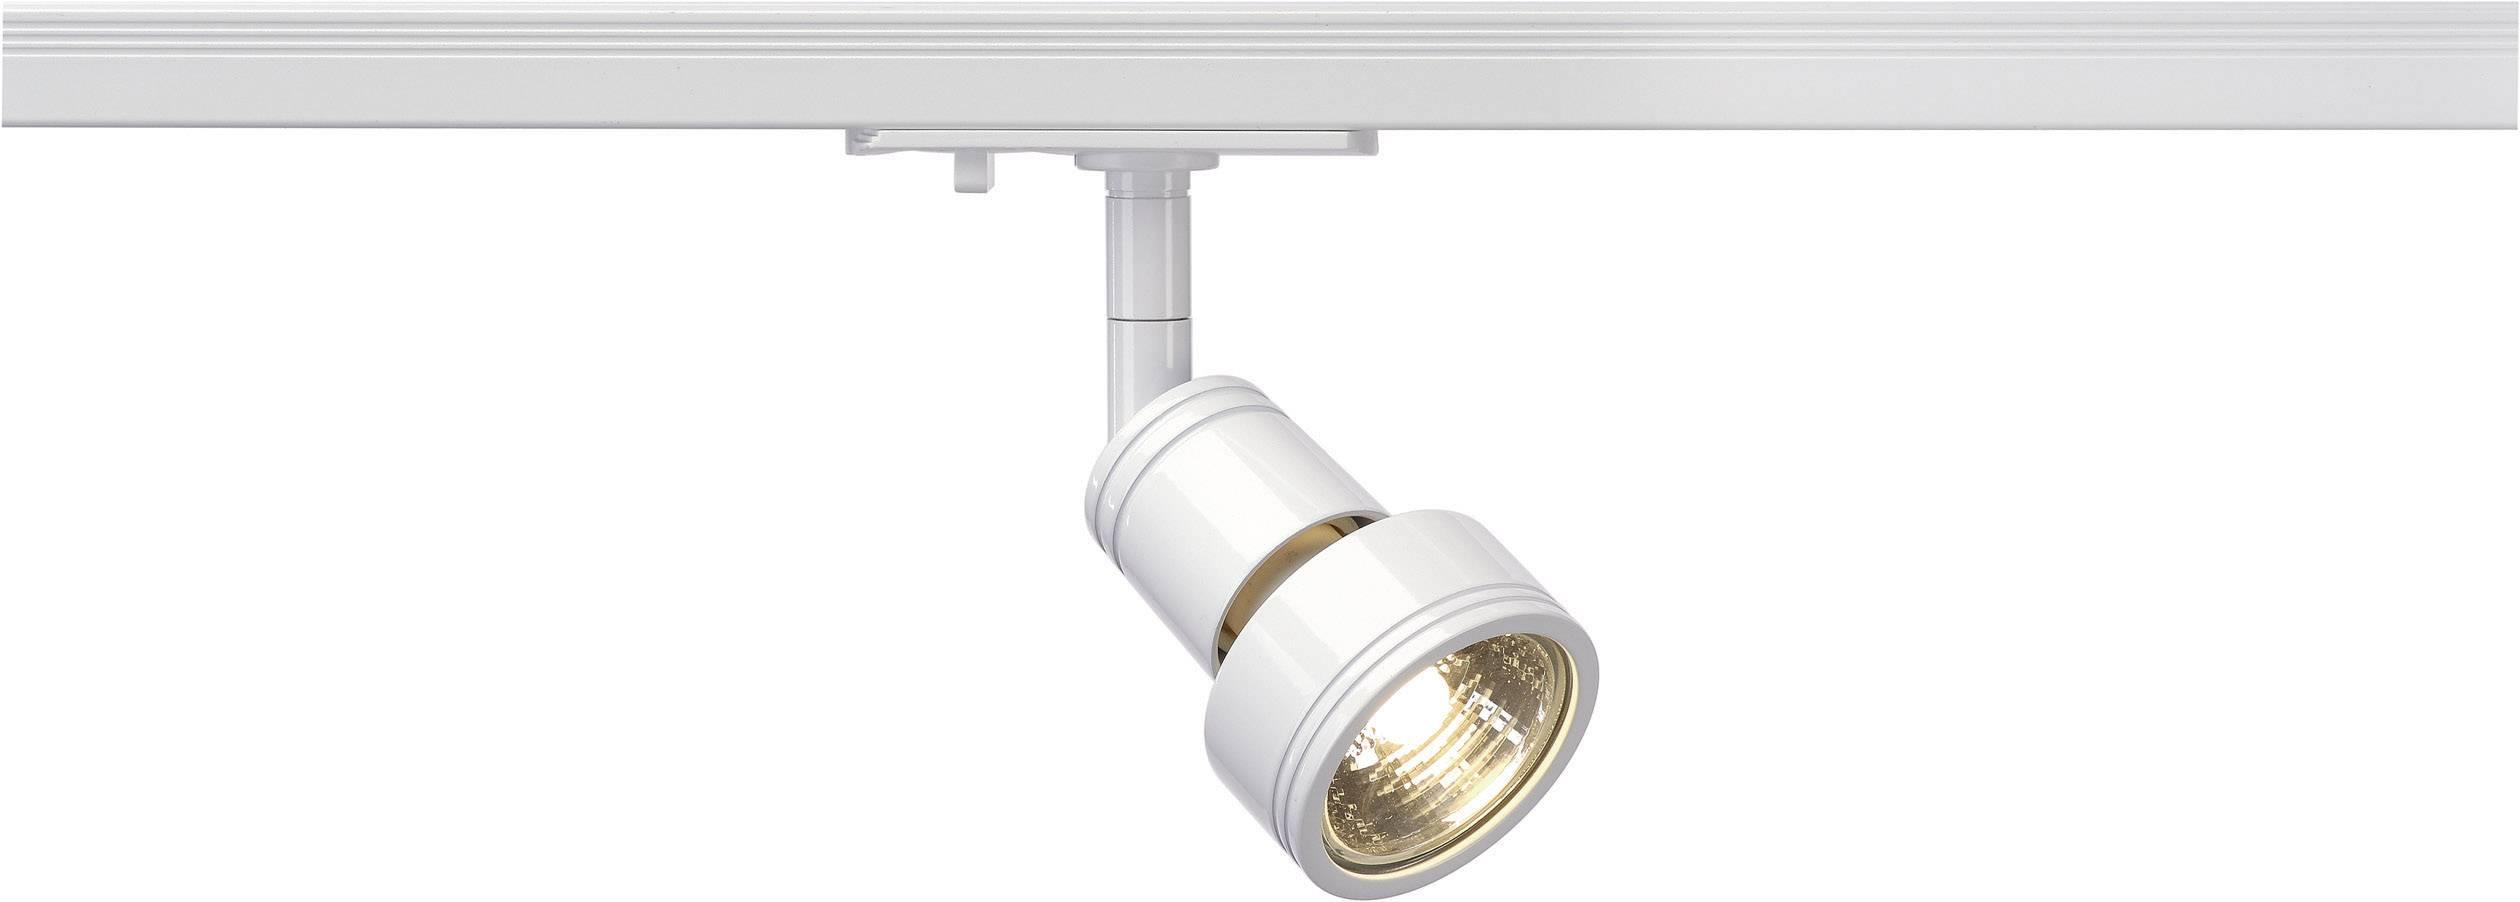 Lištové VN halogenové svítidlo SLV Puri, GU10, bílá (143391)